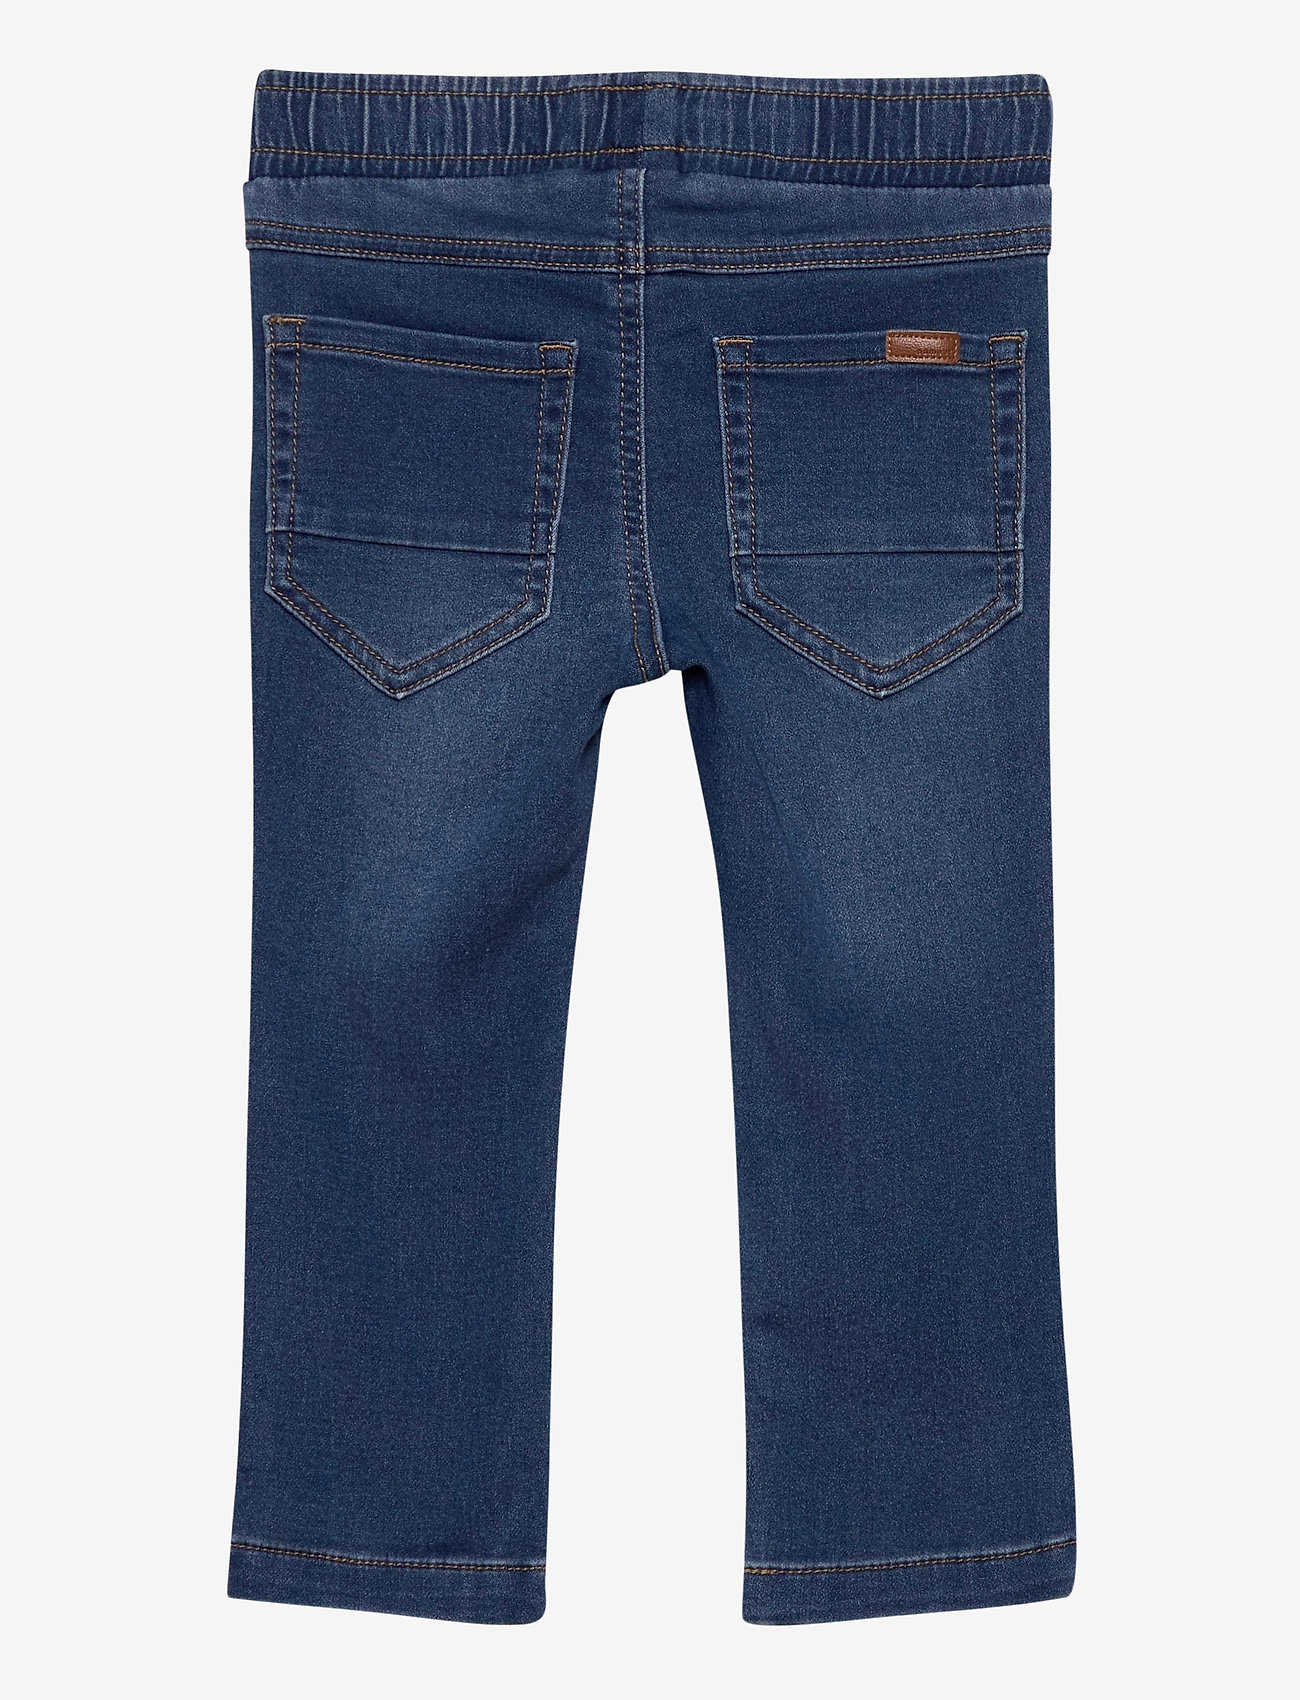 name it - NMMROBIN DNMTHAYERS 2385 SWE PANT - jeans - medium blue denim - 1